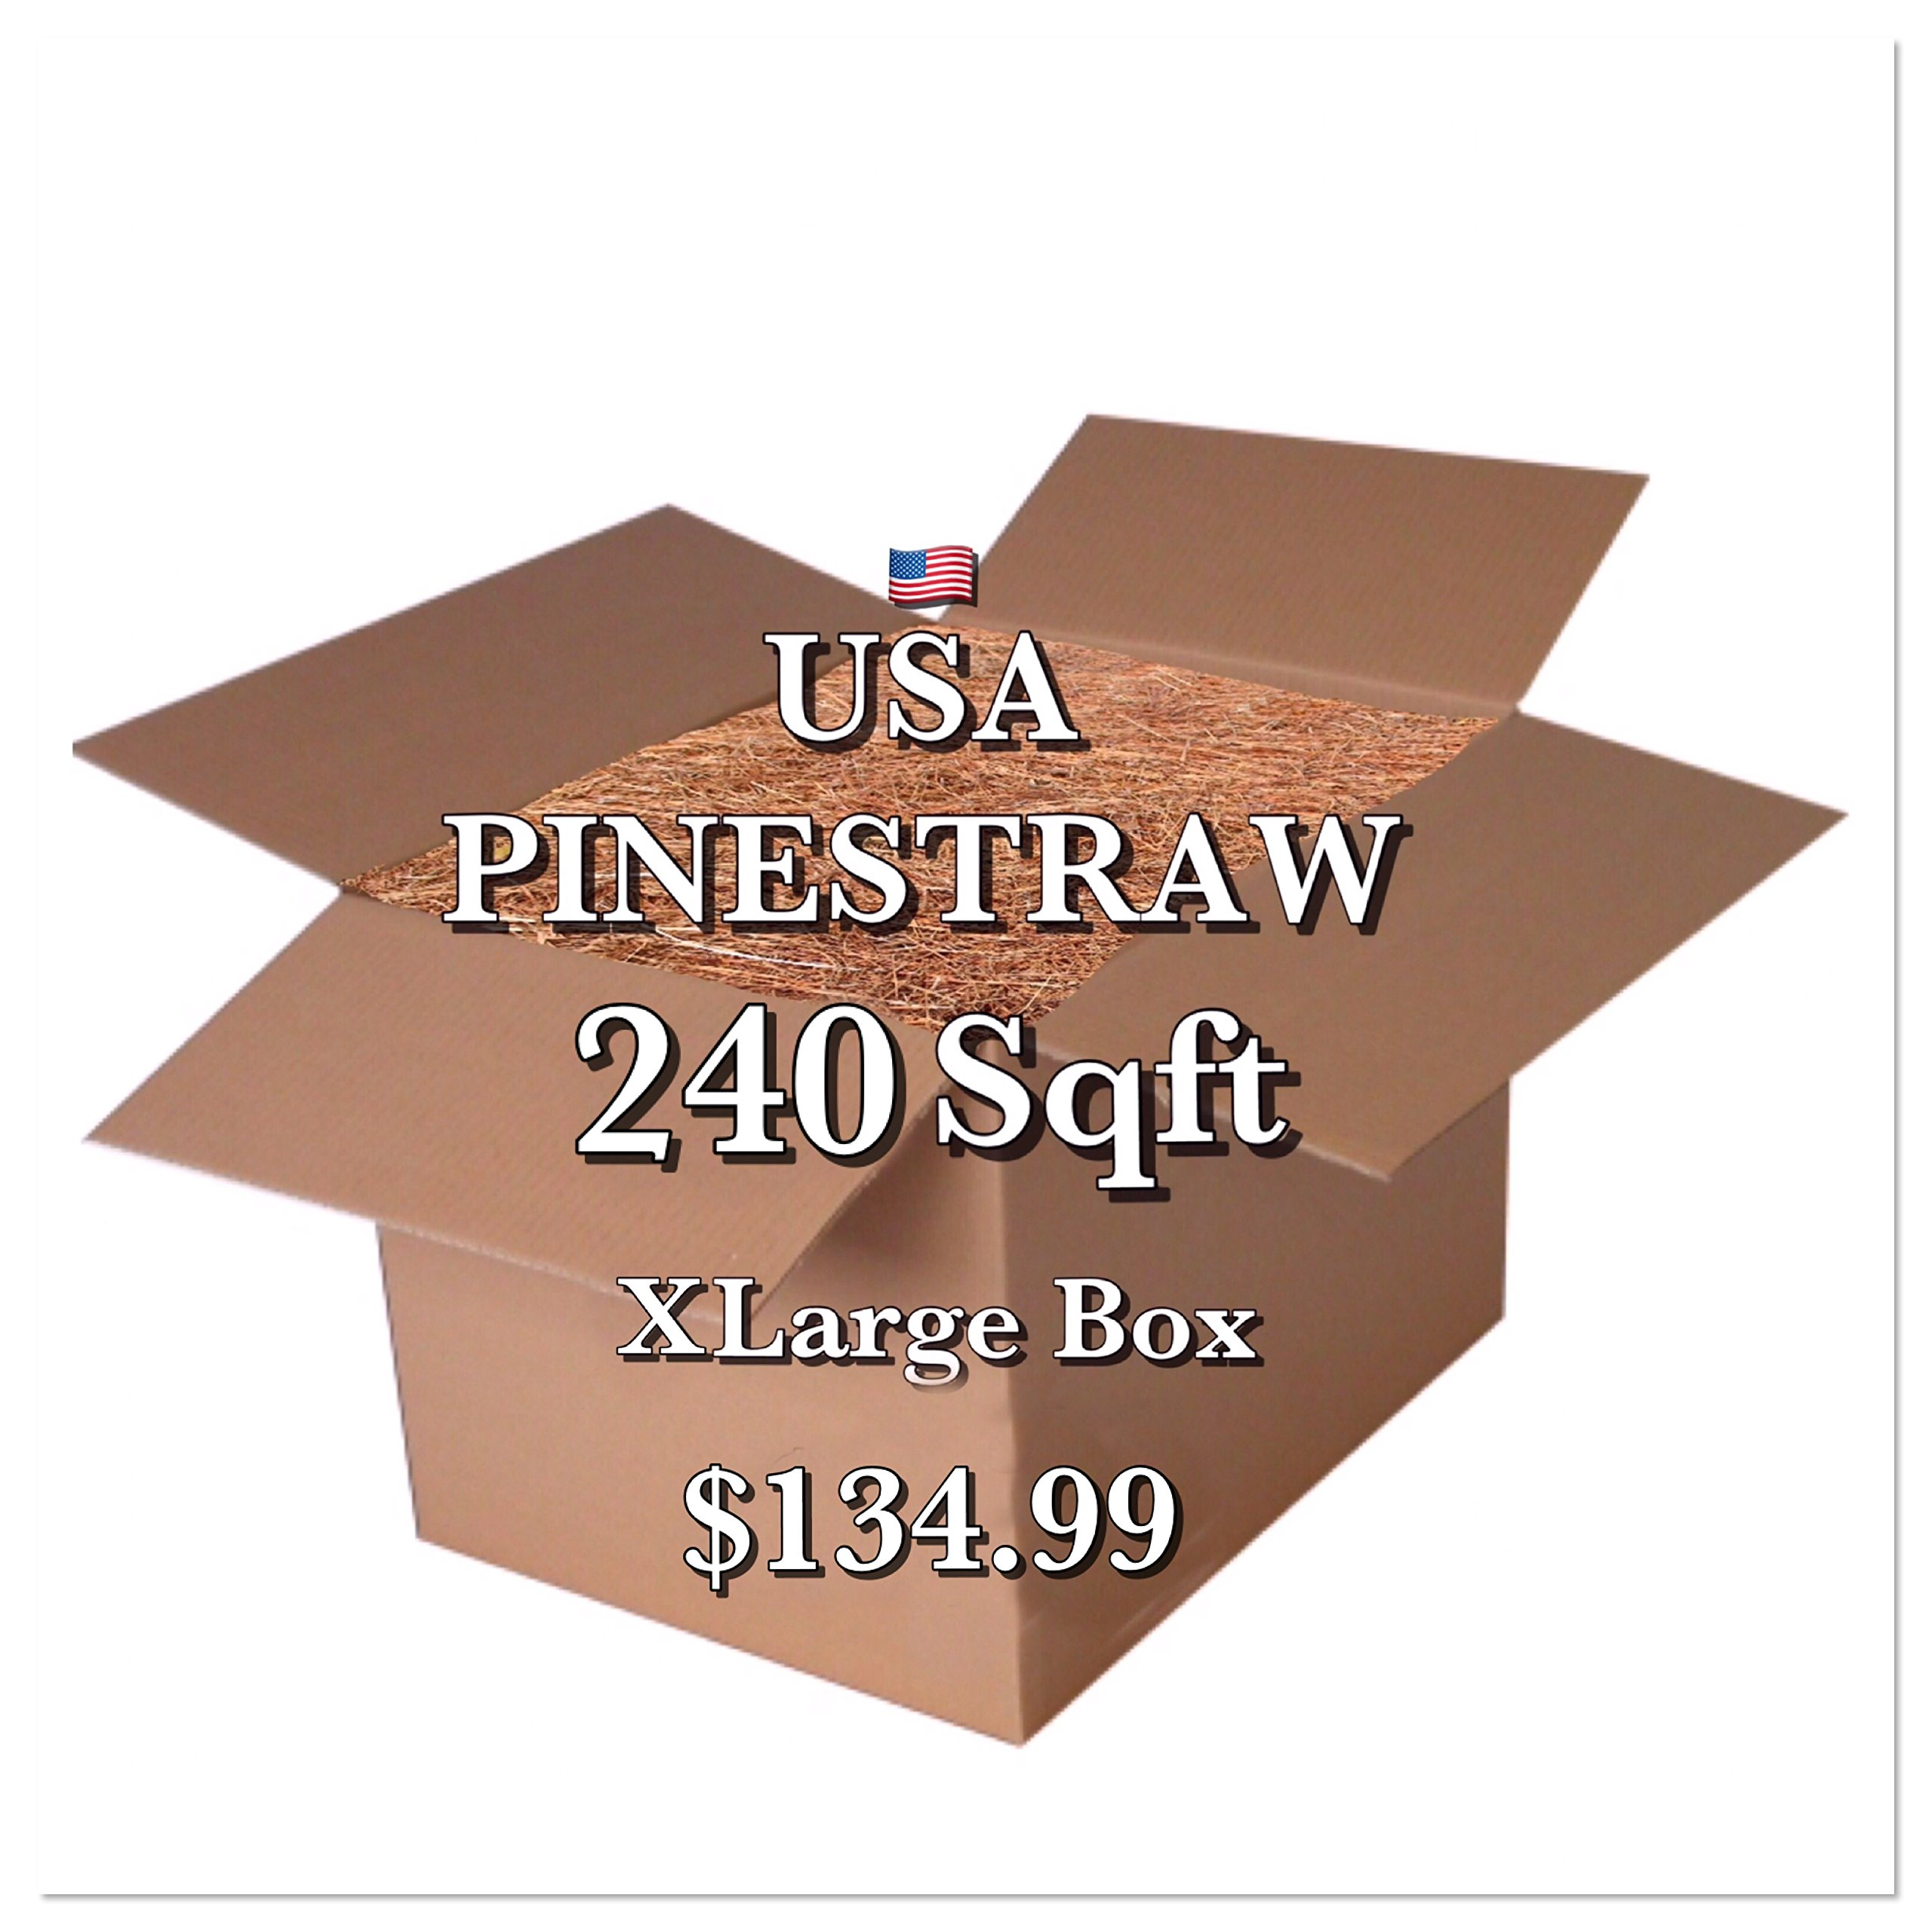 Pine Straw Mulch - 14 '' Premium Long Needle - 240 Sqft - New Bigger Box by USA Pinestraw